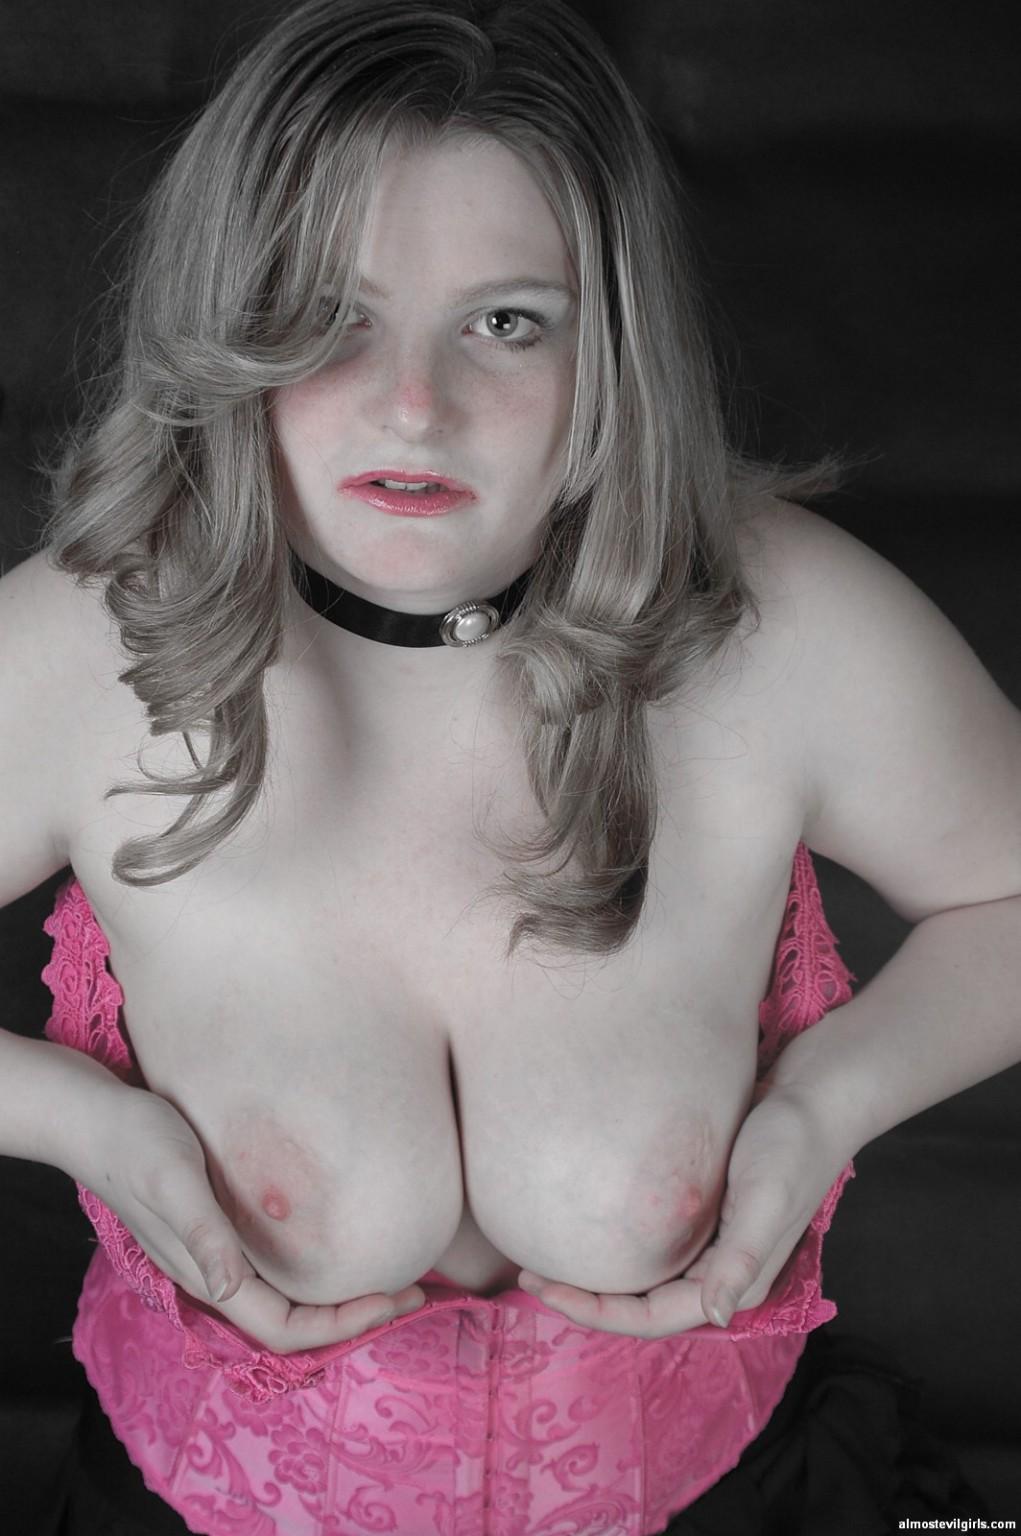 Мэдисон в розовом корсете